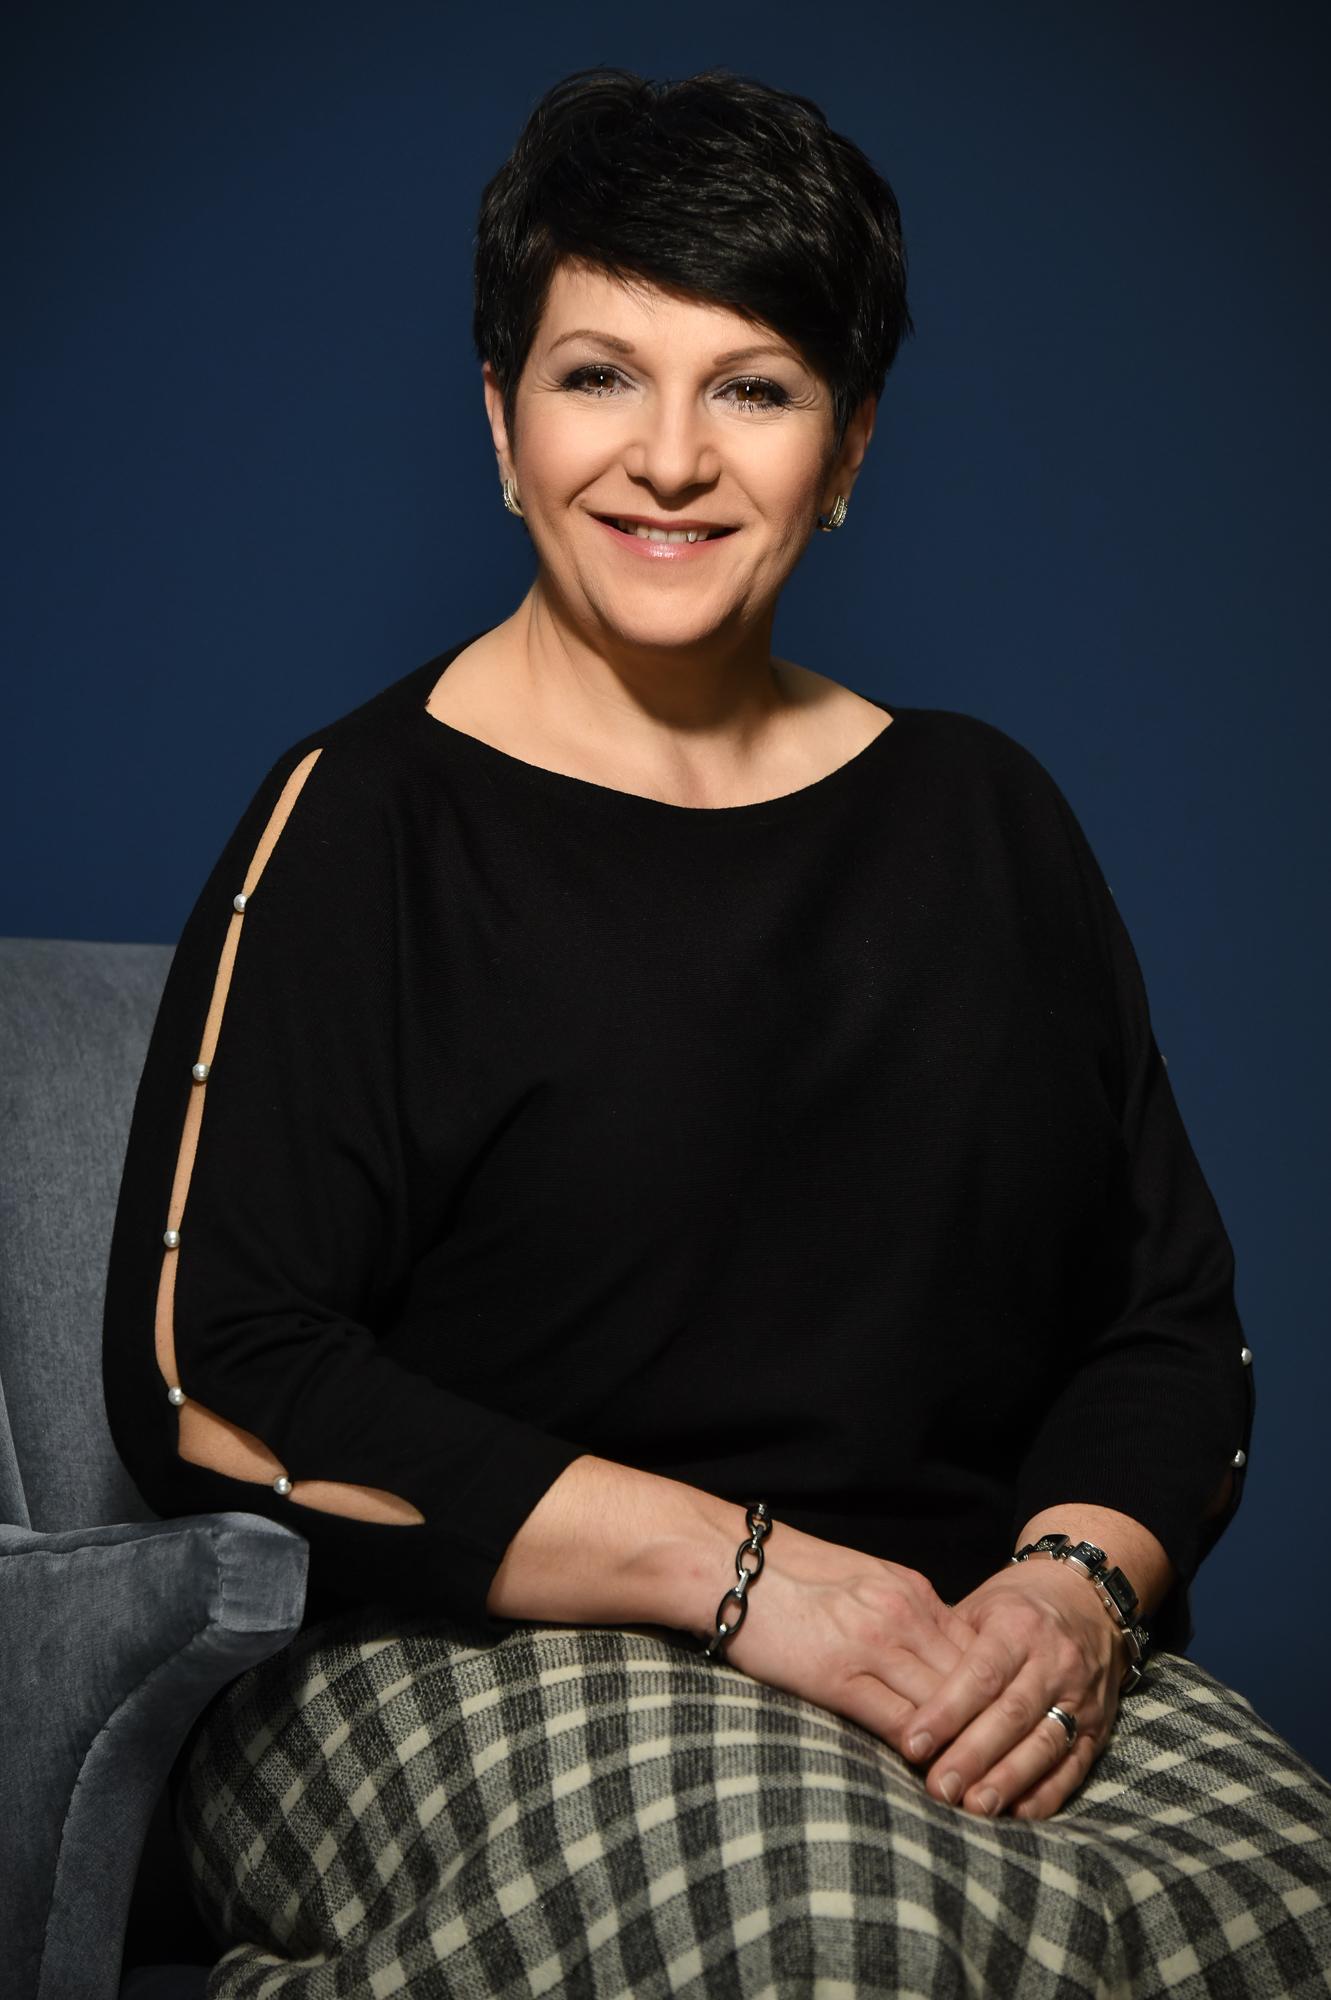 Daniela Straková-Šedrlová